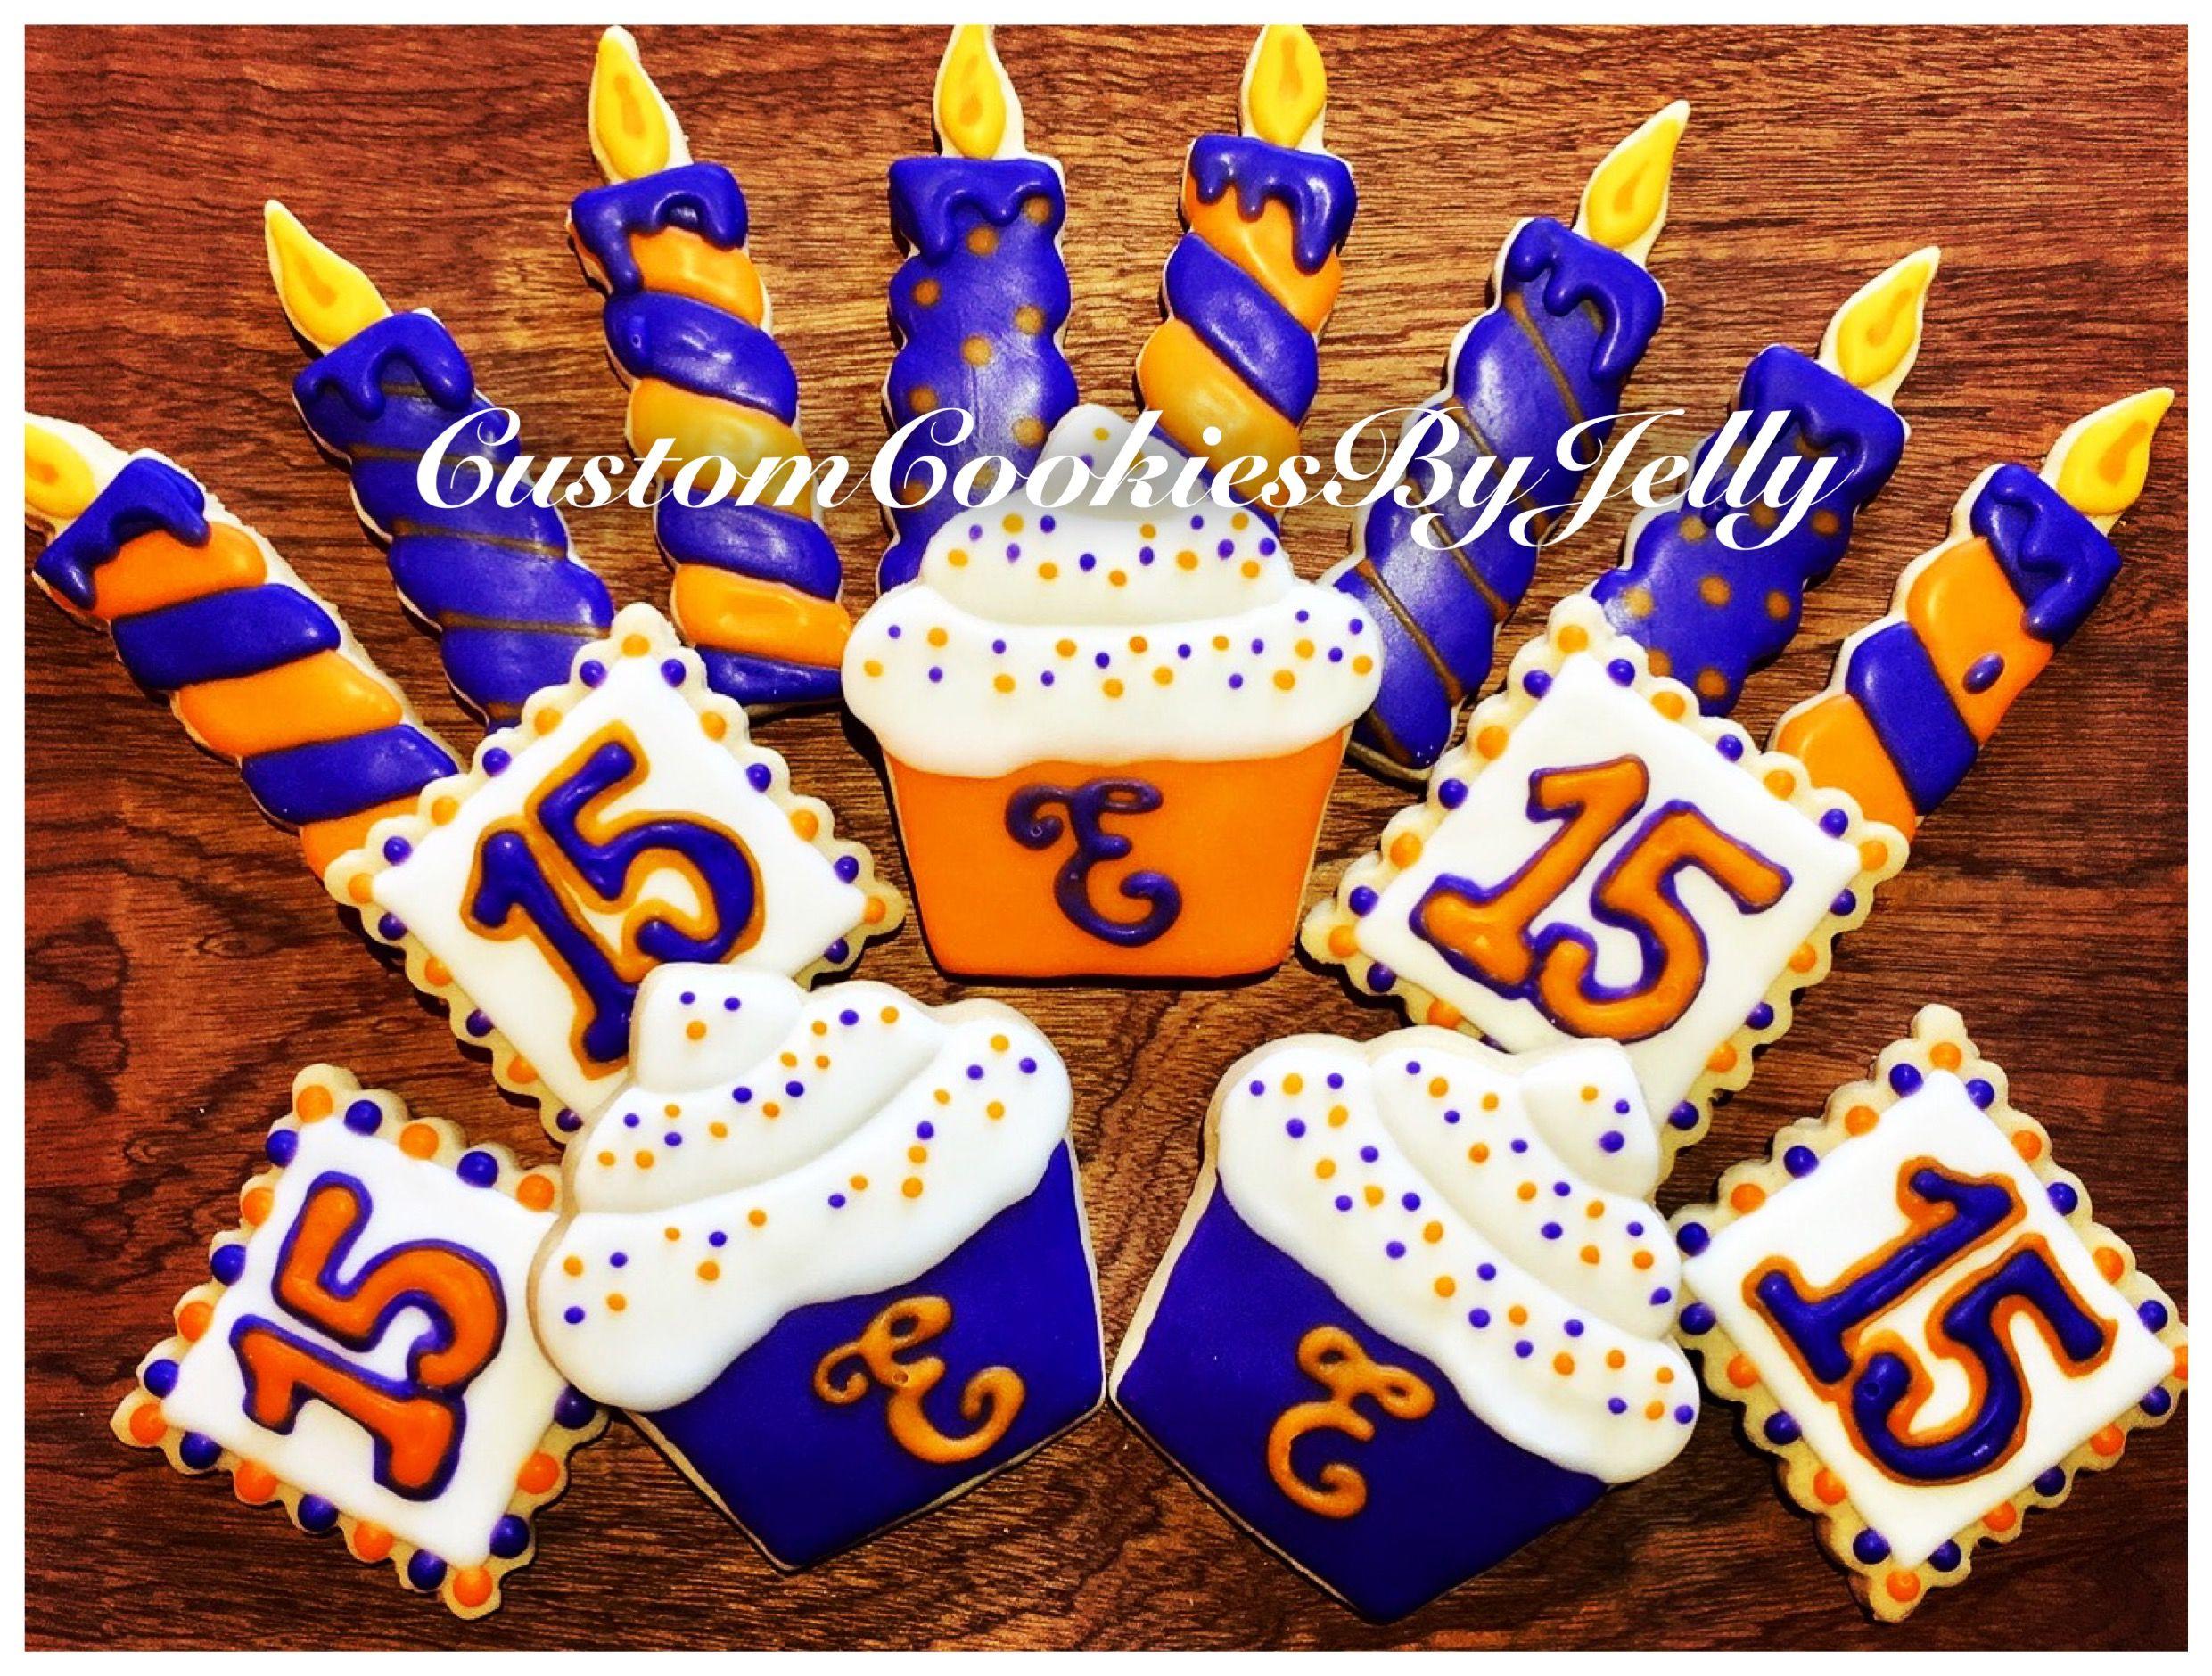 Birthday Sugar Cookies @CustomCookiesByJelly